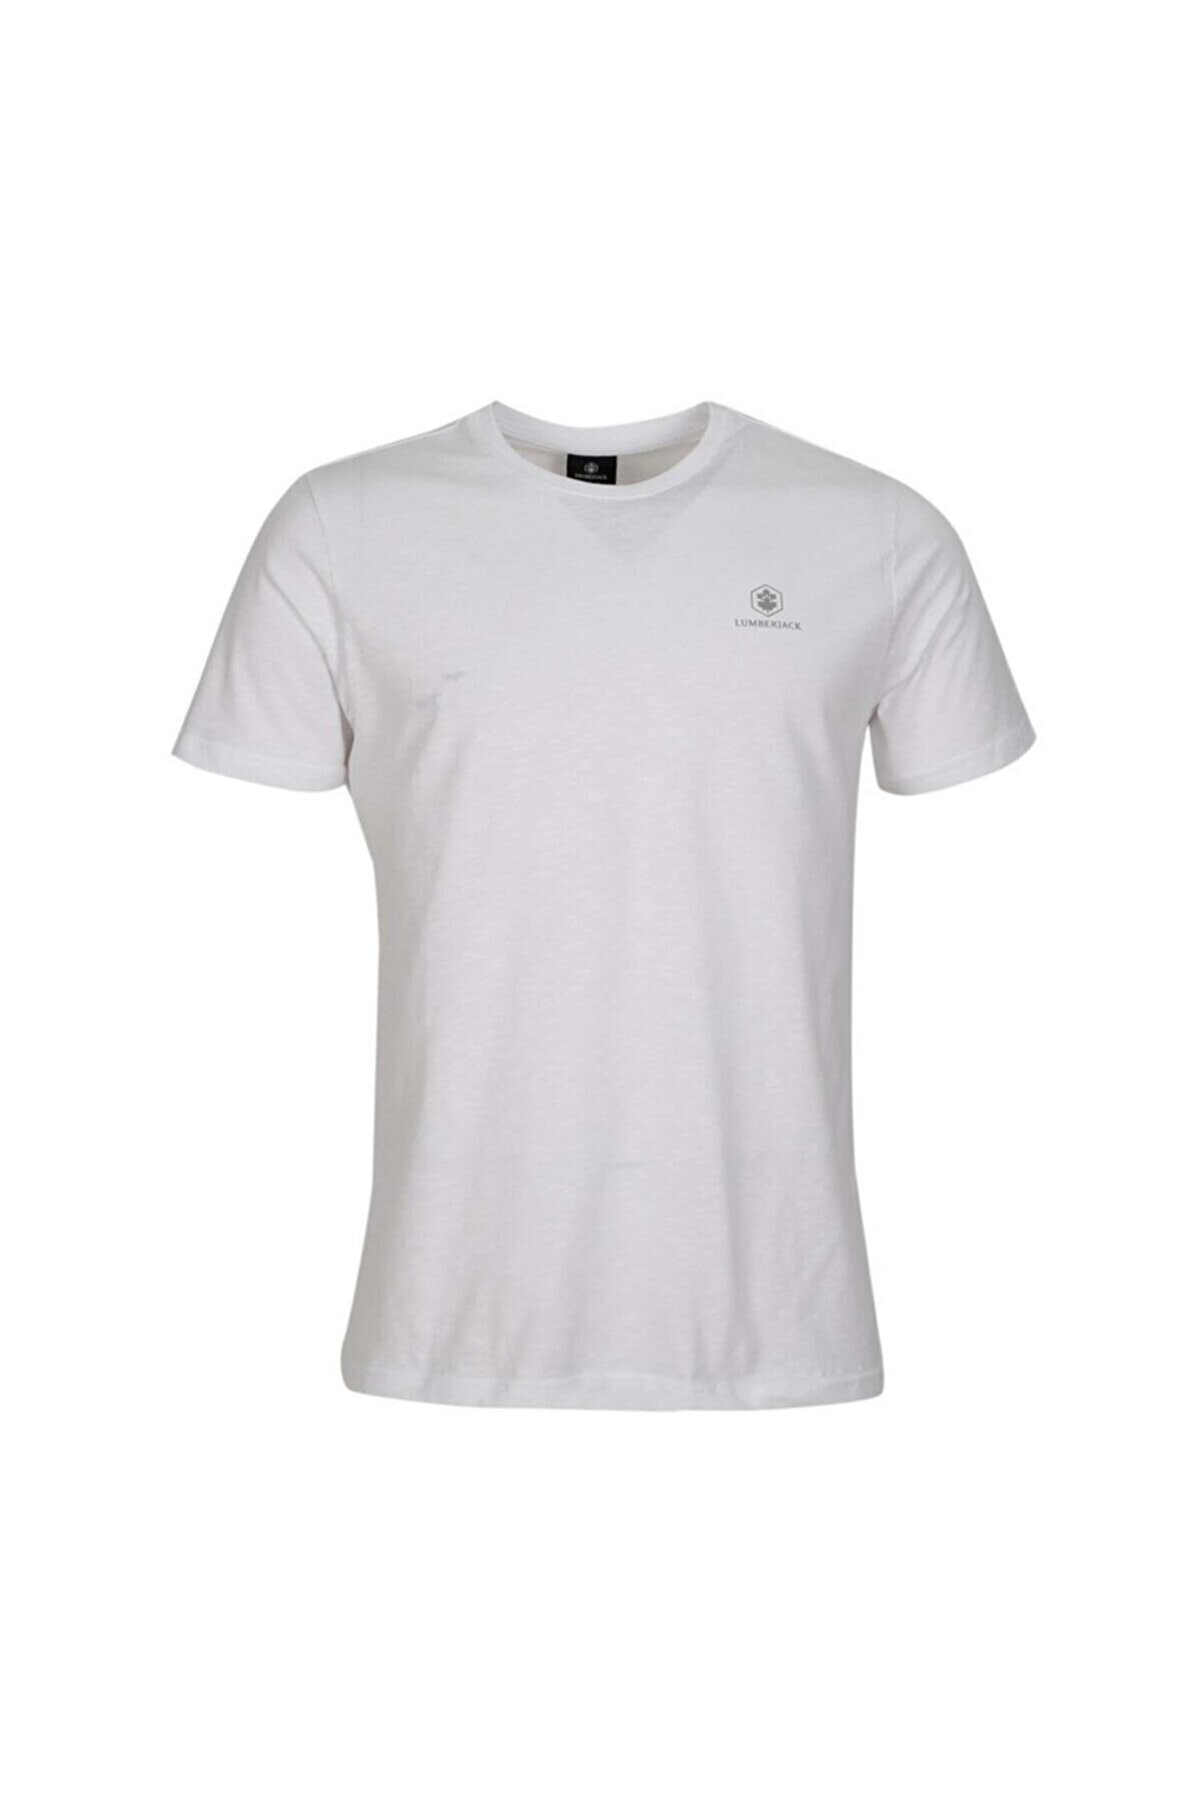 Lumberjack M-1815 RAELYN KK TSHIRT B Beyaz Erkek T-Shirt 100664494